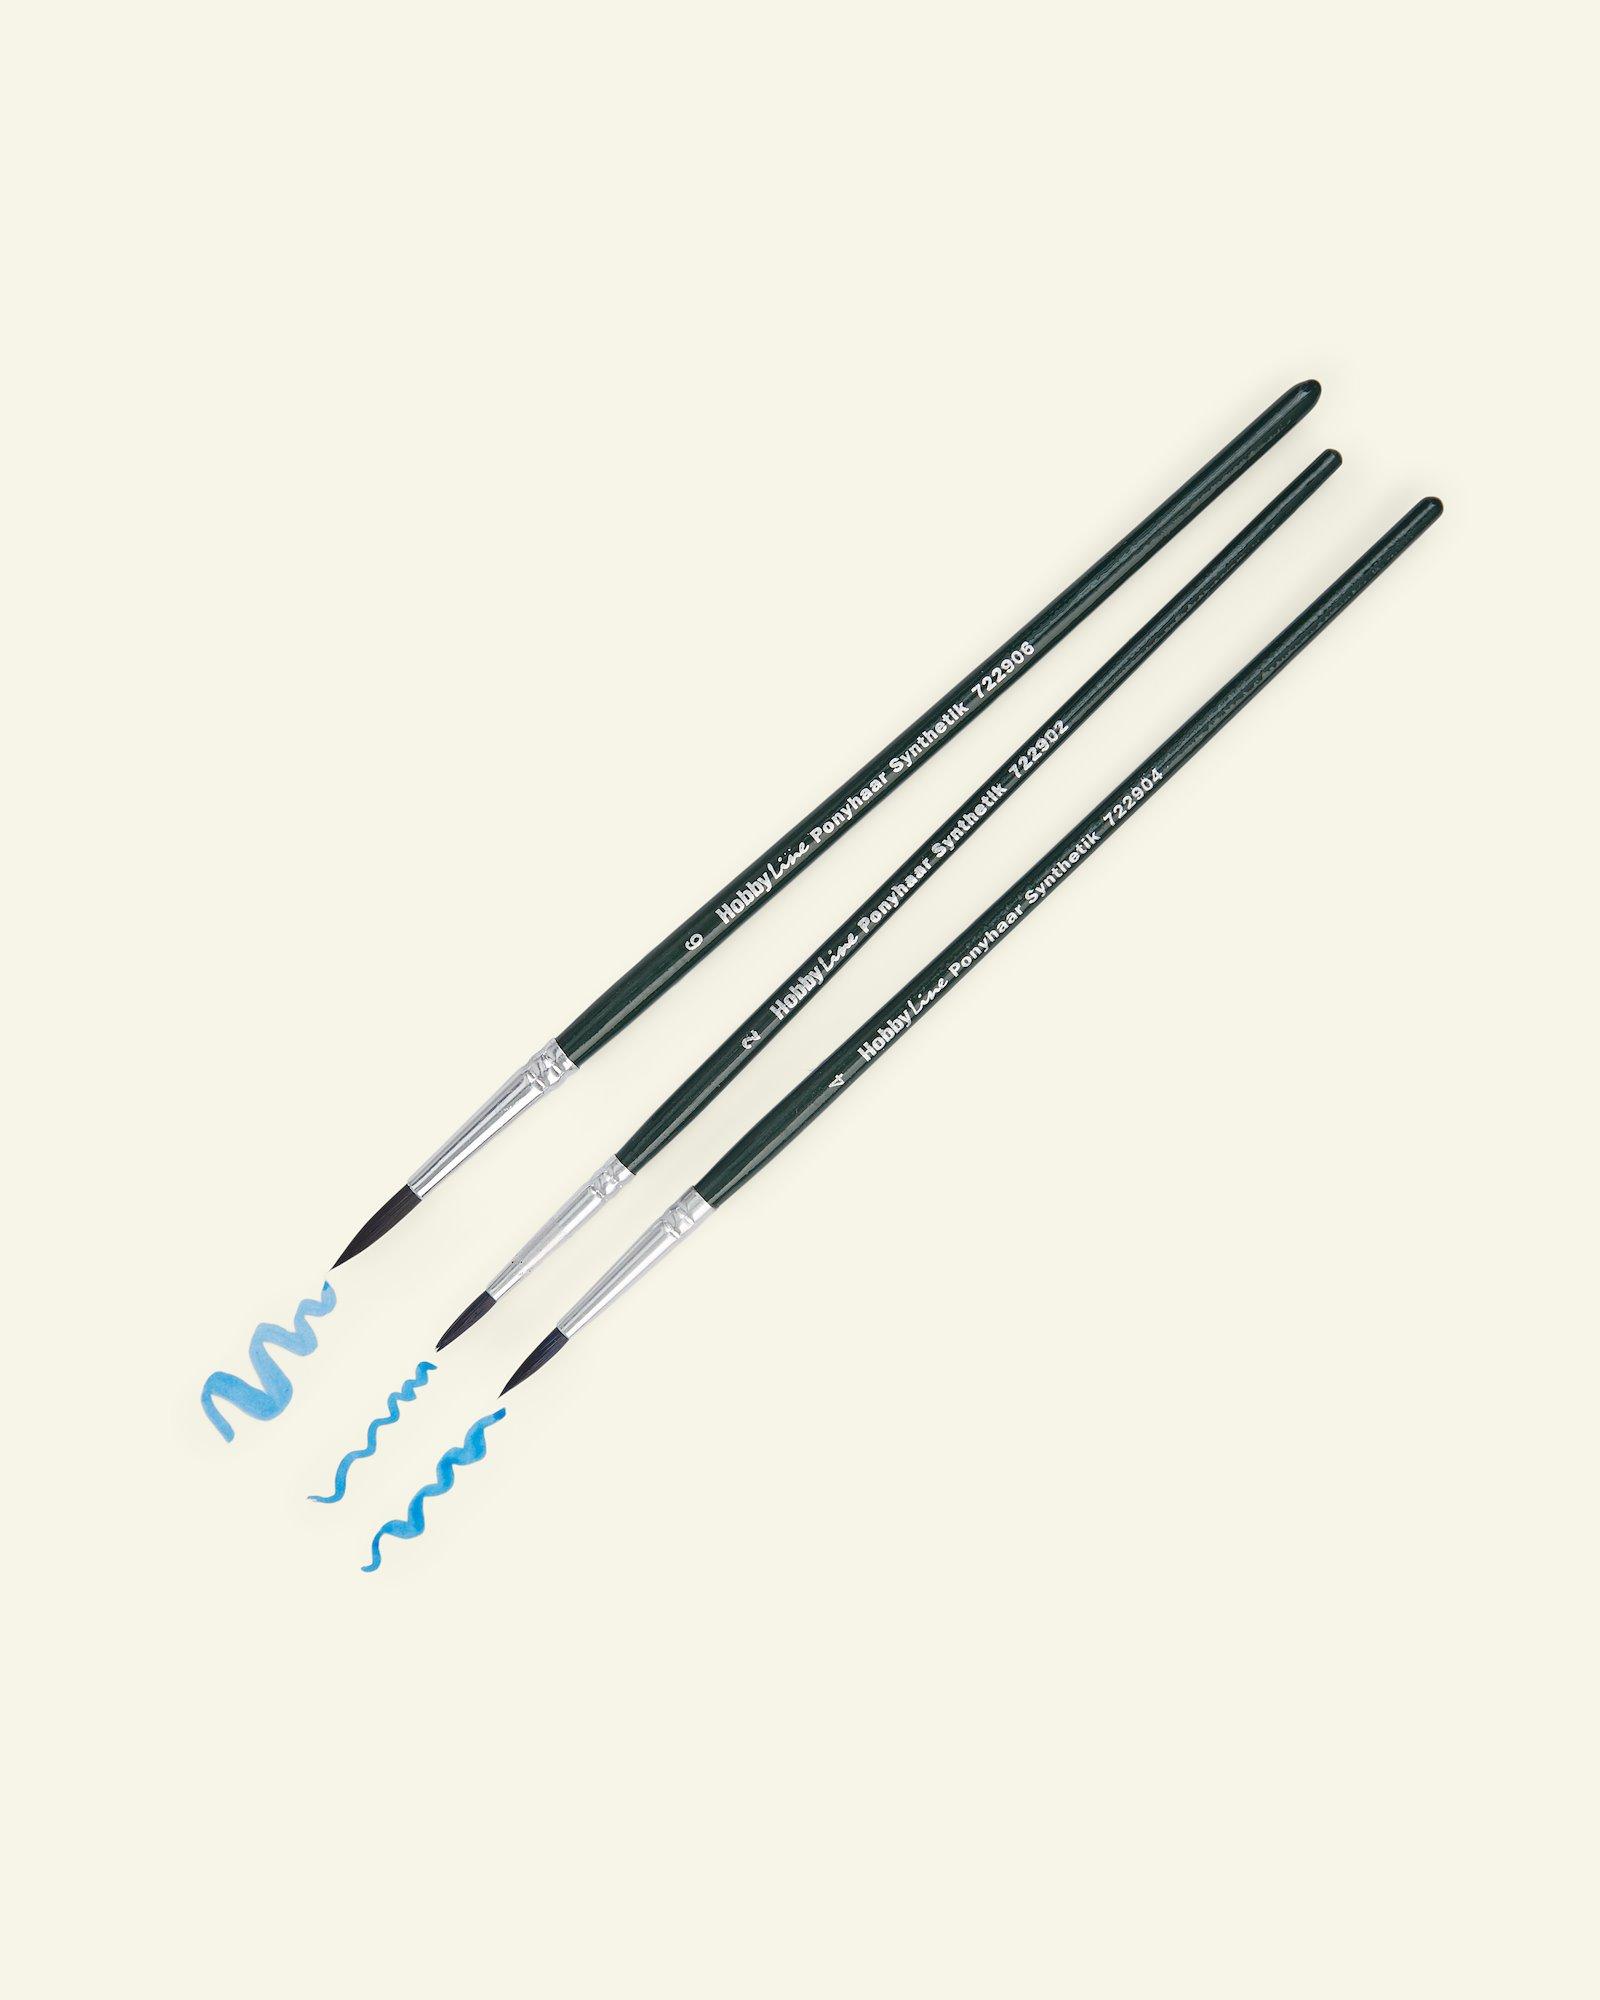 Javana universal brushes 3pcs